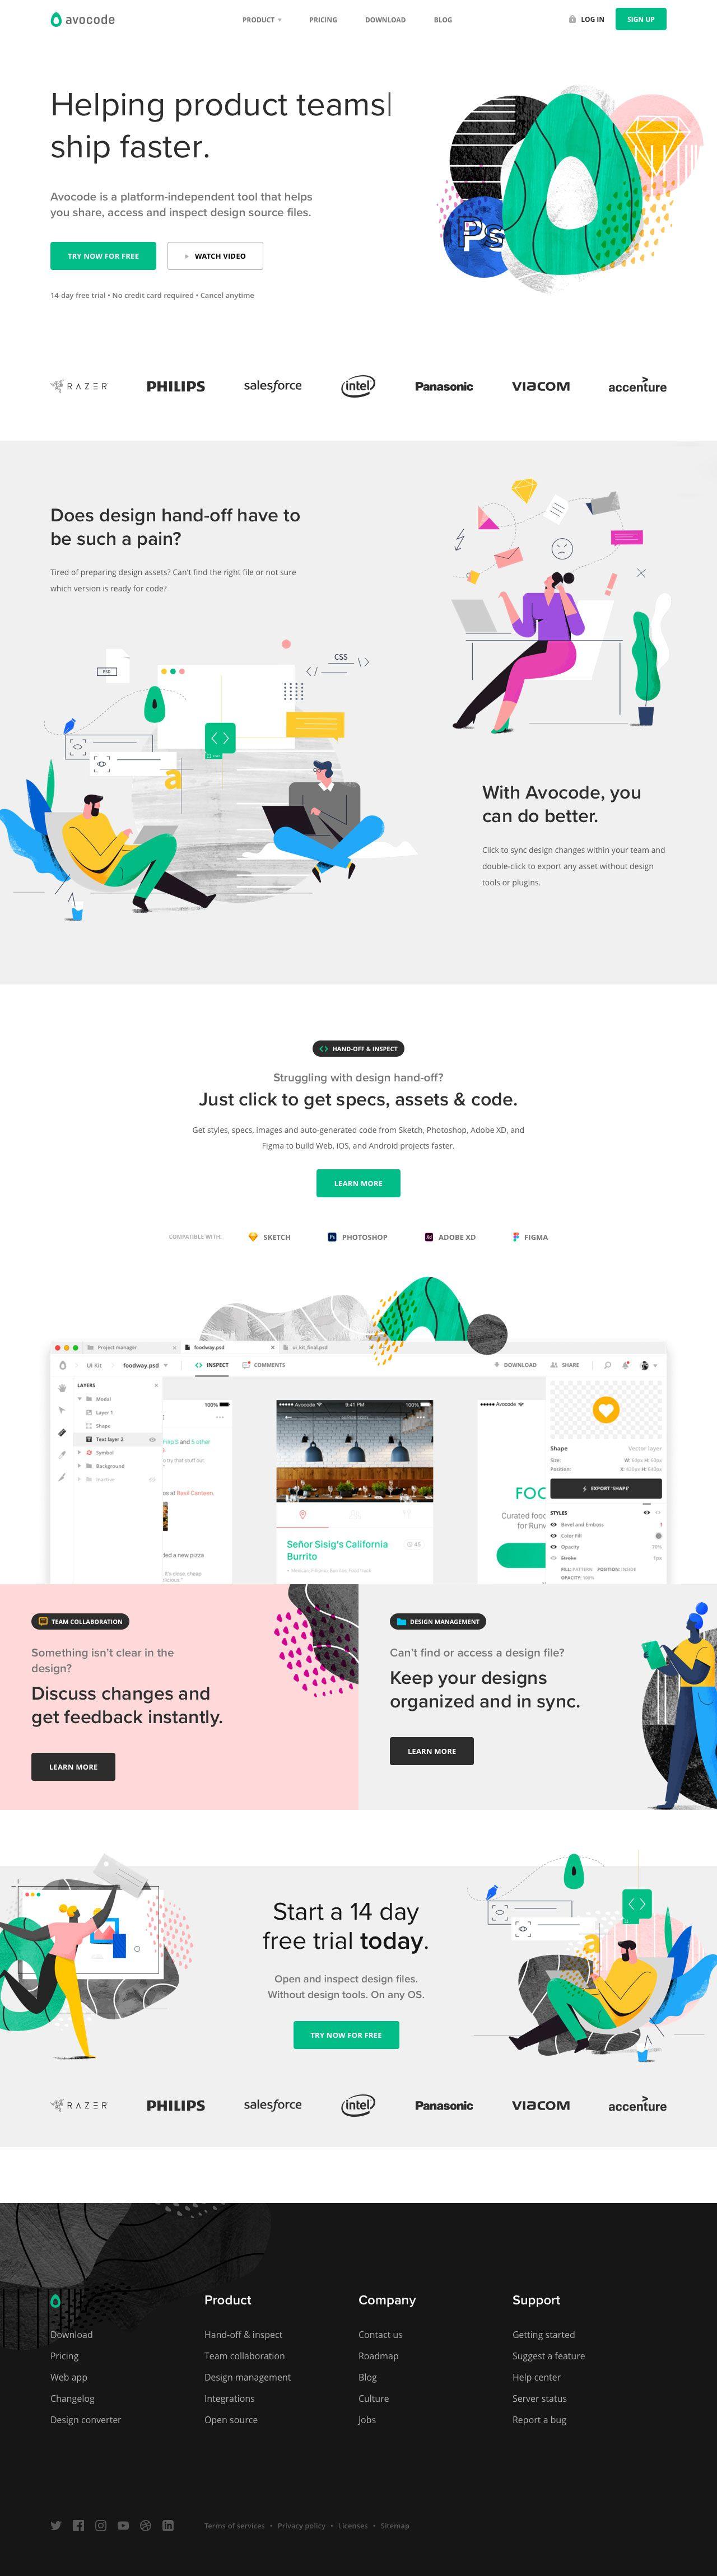 Avocode Helping You Ship Faster Web Design Examples Web App Design Fun Website Design